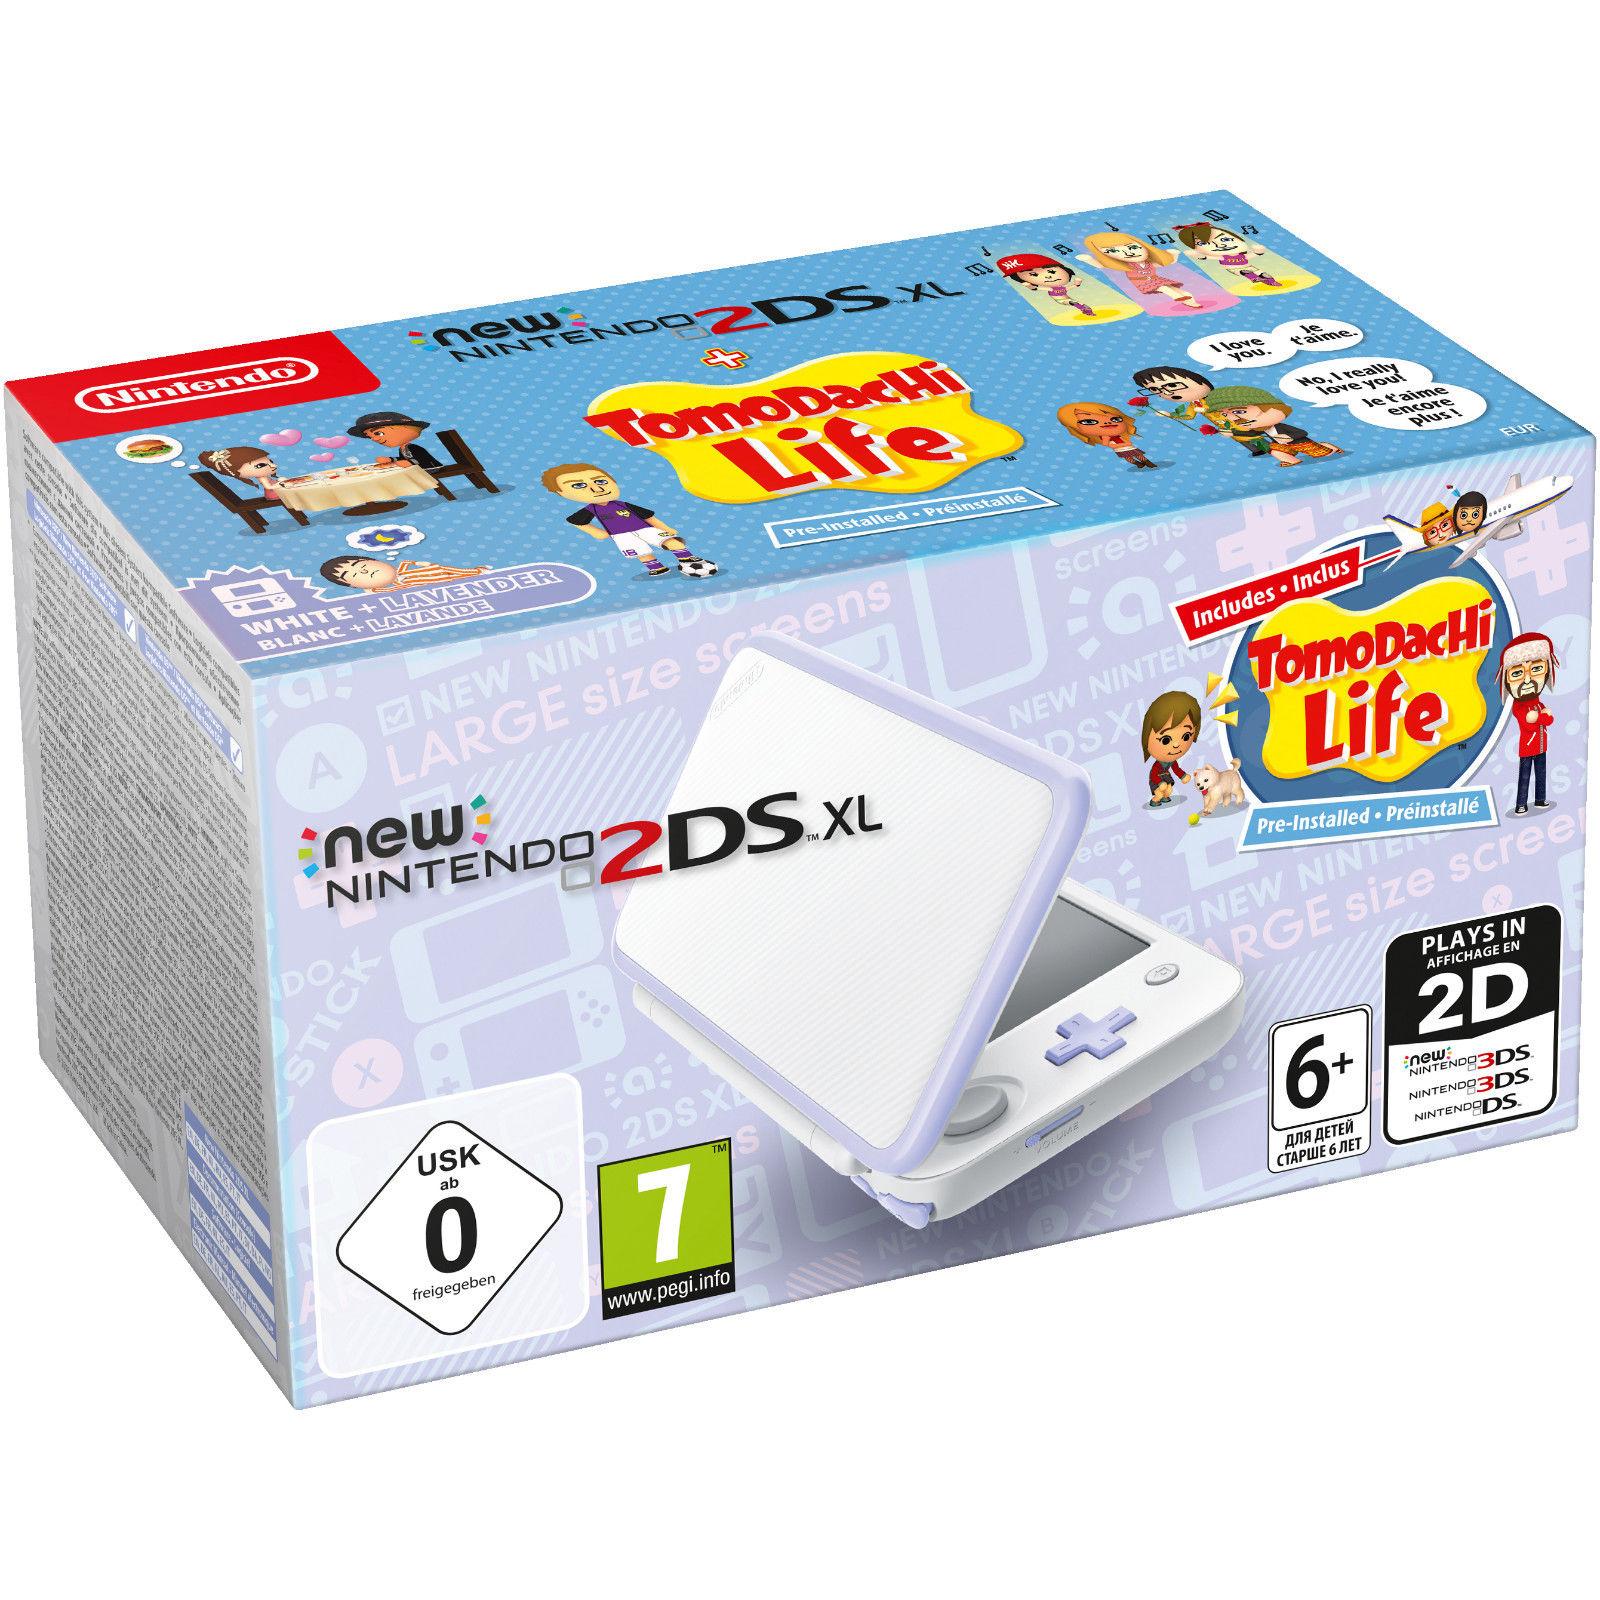 Nintendo New Nintendo 2DS XL Spielekonsole + Tomodachi Life weiß/lavendel